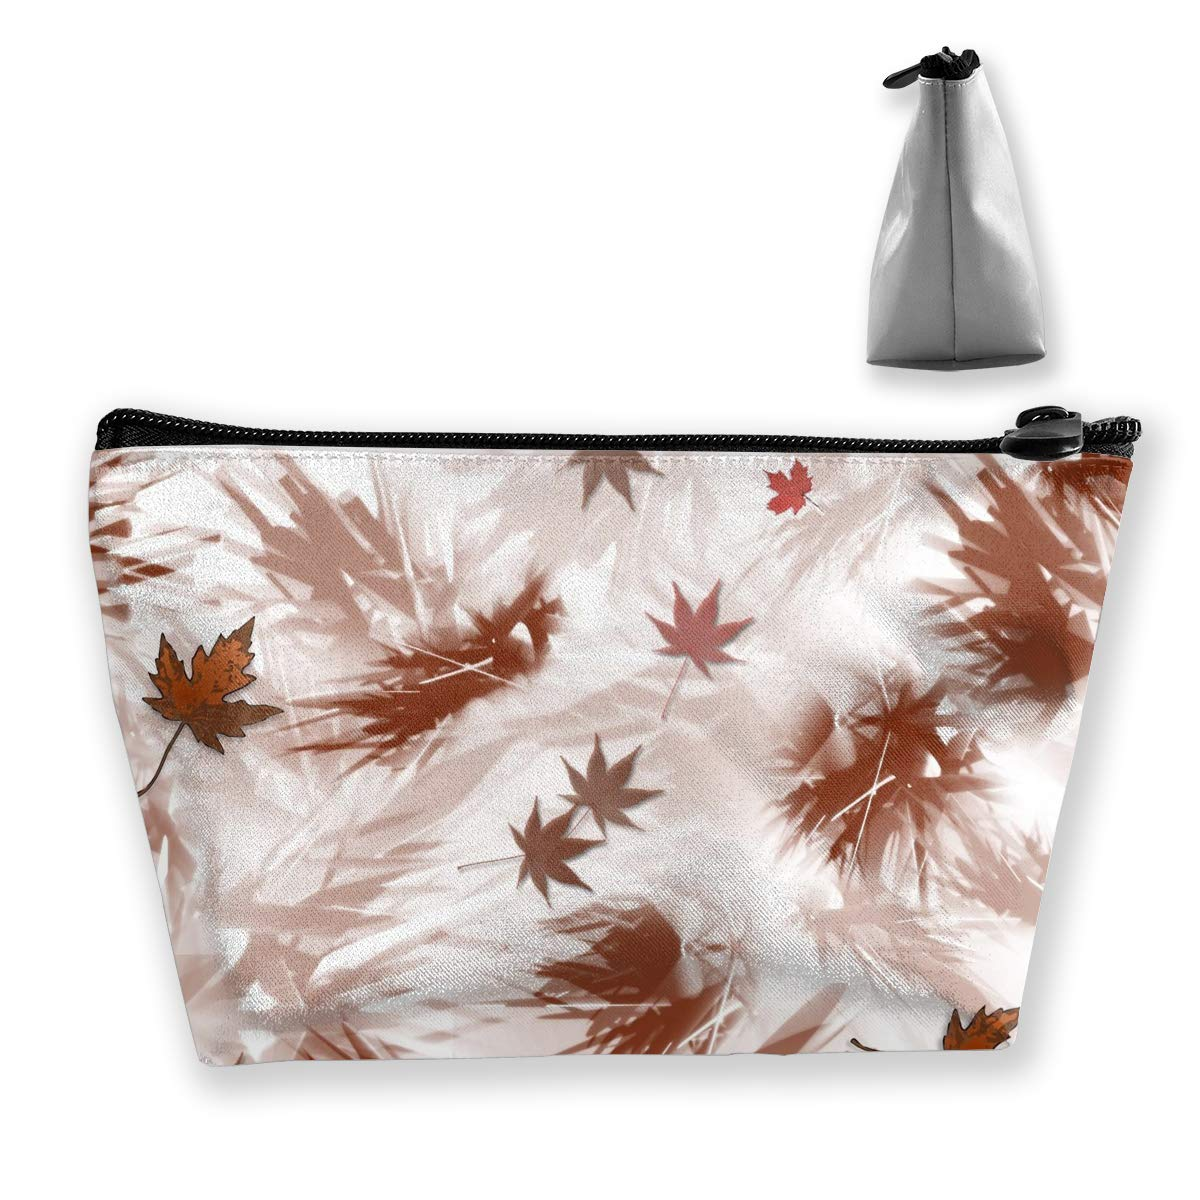 Trapezoid Toiletry Pouch Portable Travel Bag Autumn Leaves Pen Organizer